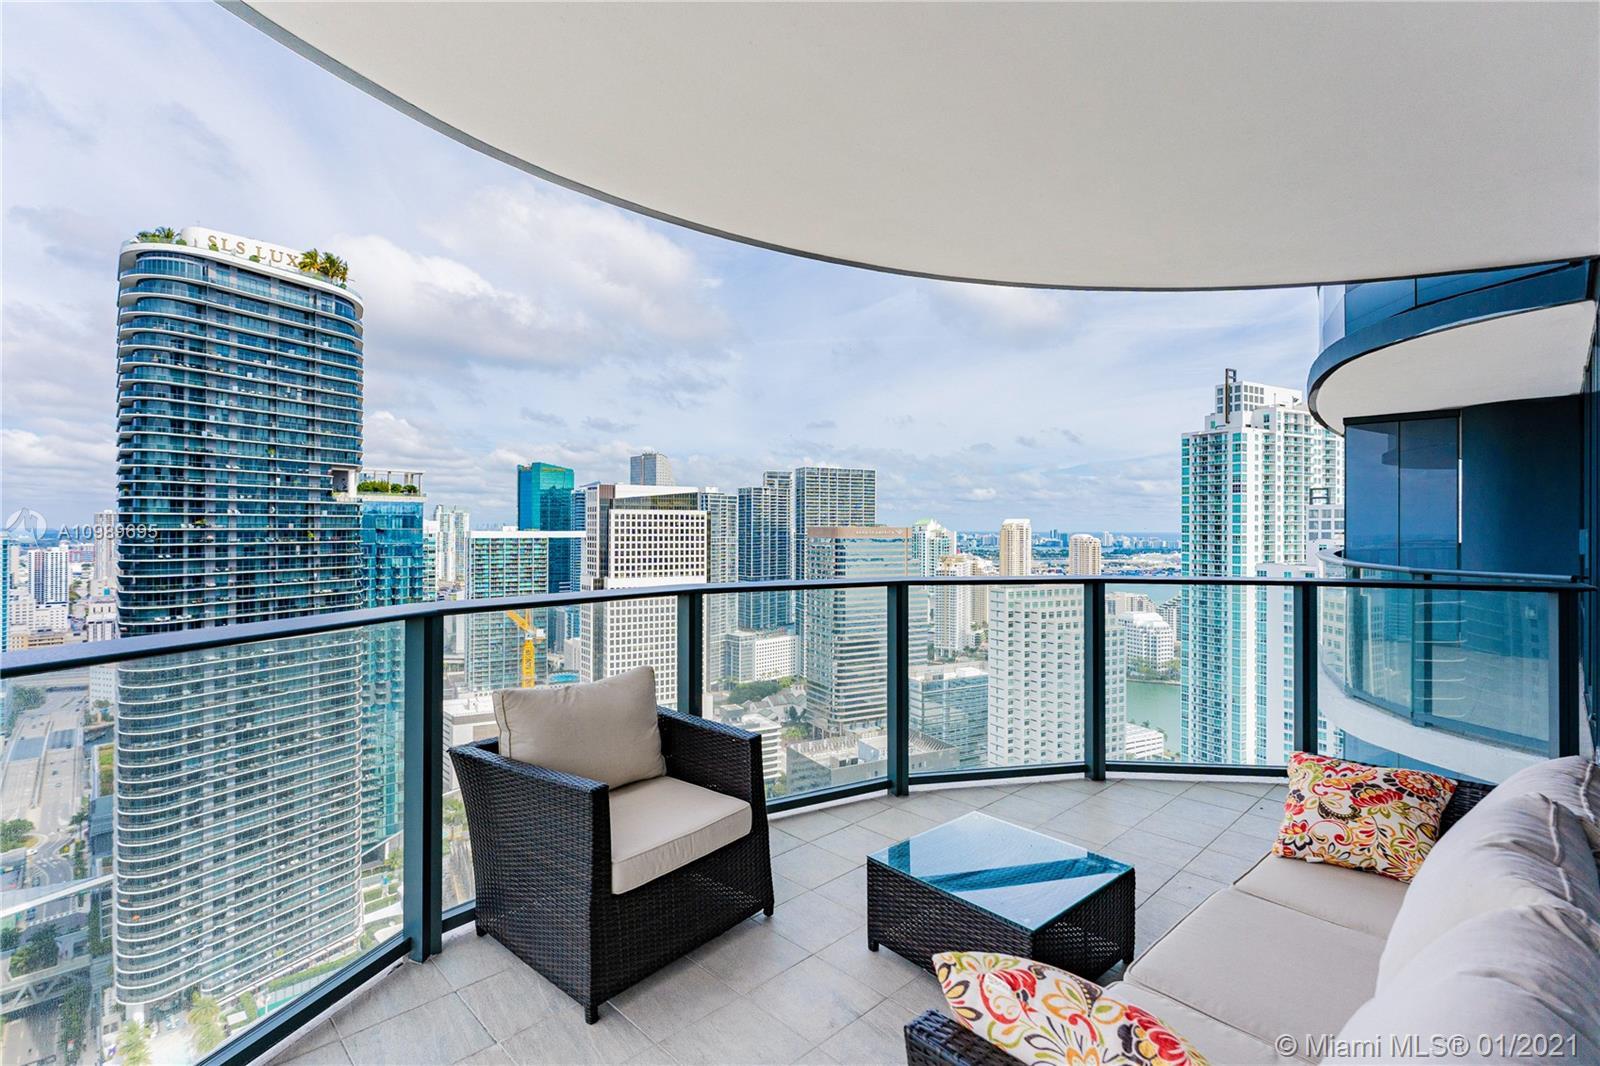 Brickell FlatIron #4512 - 1000 Brickell Plaza #4512, Miami, FL 33131